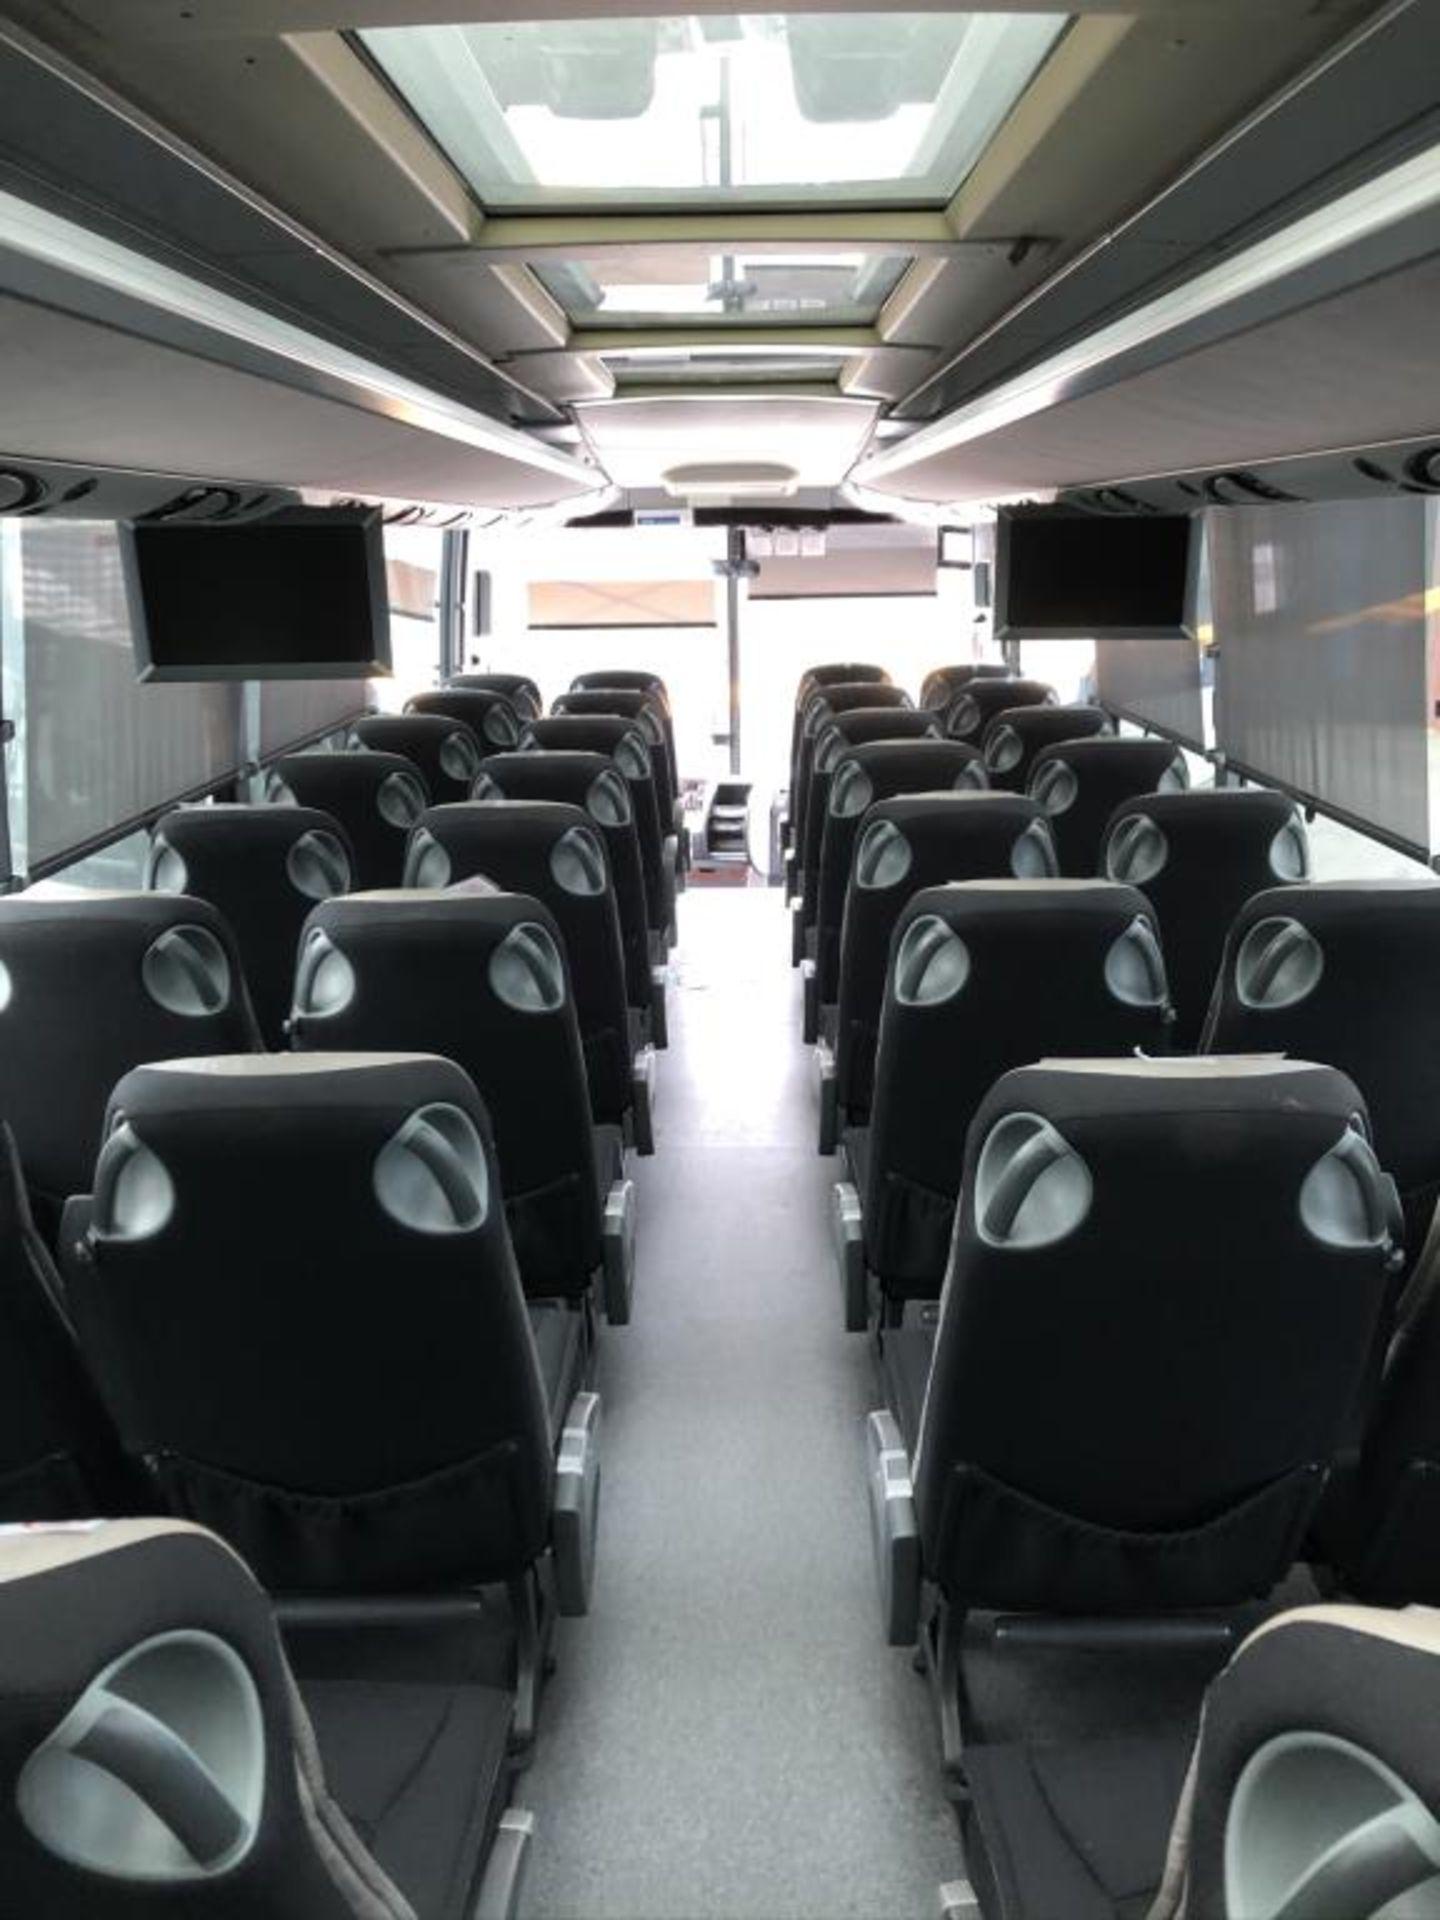 Motor Coach - Image 7 of 13